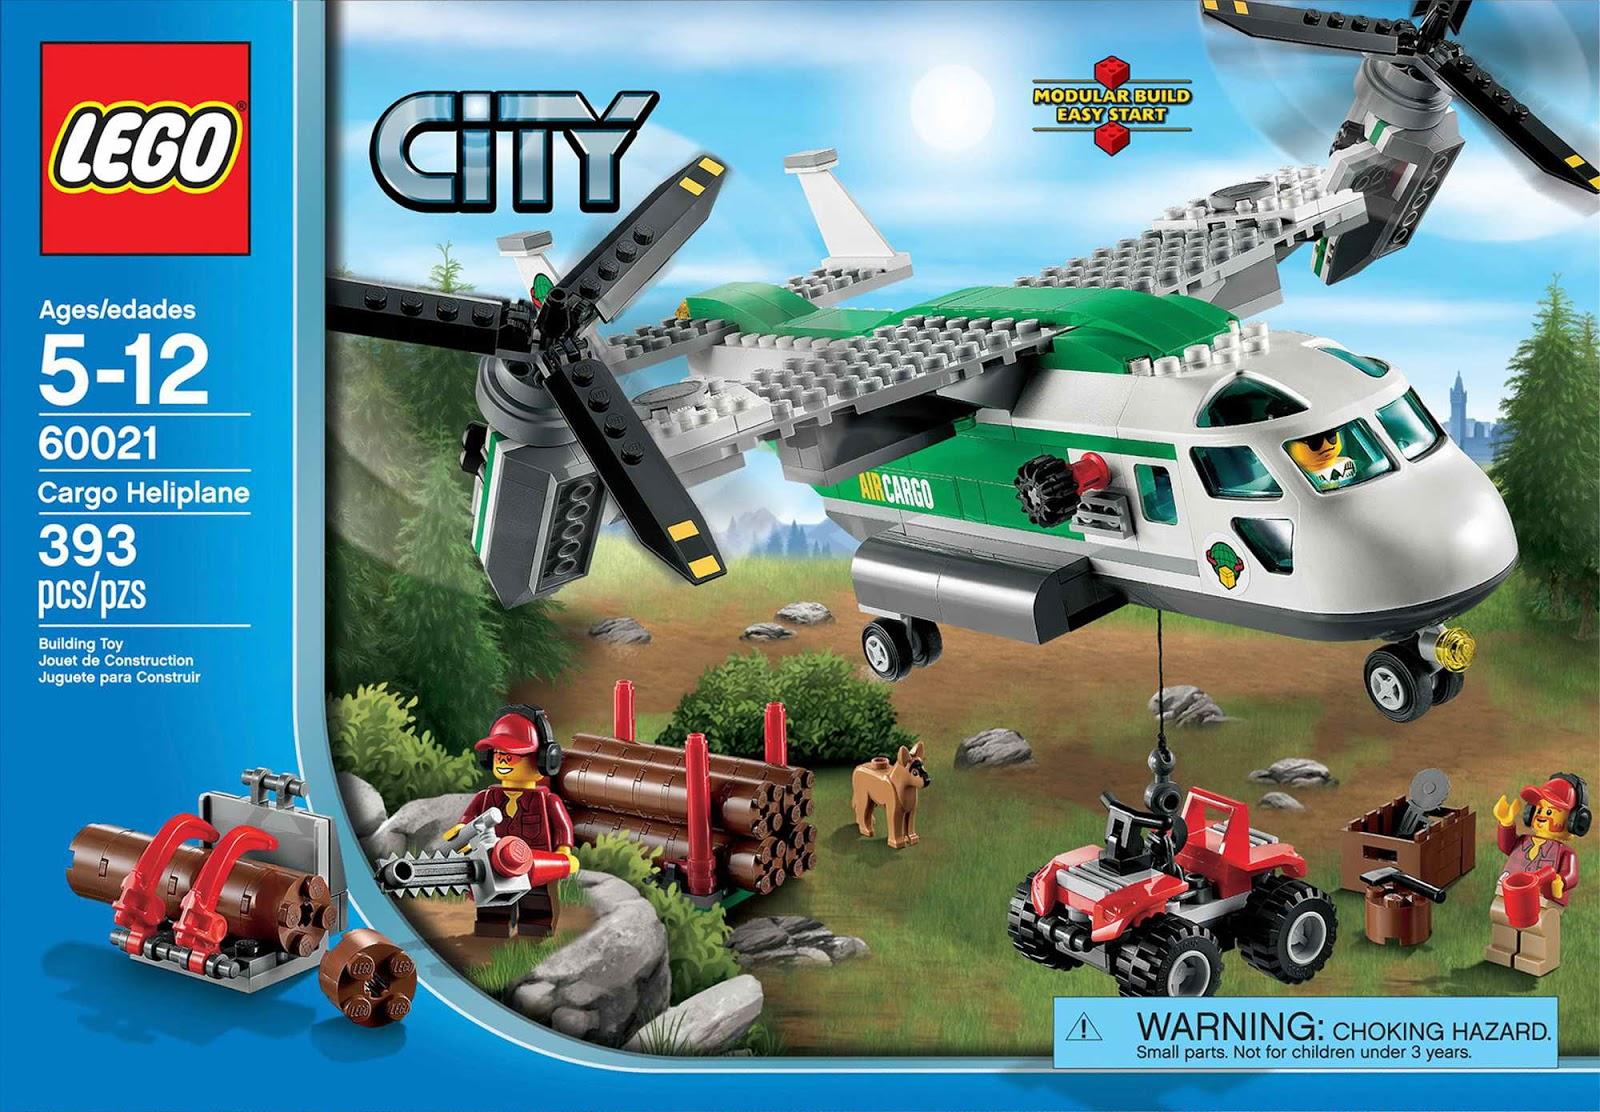 how to build lego set 3221